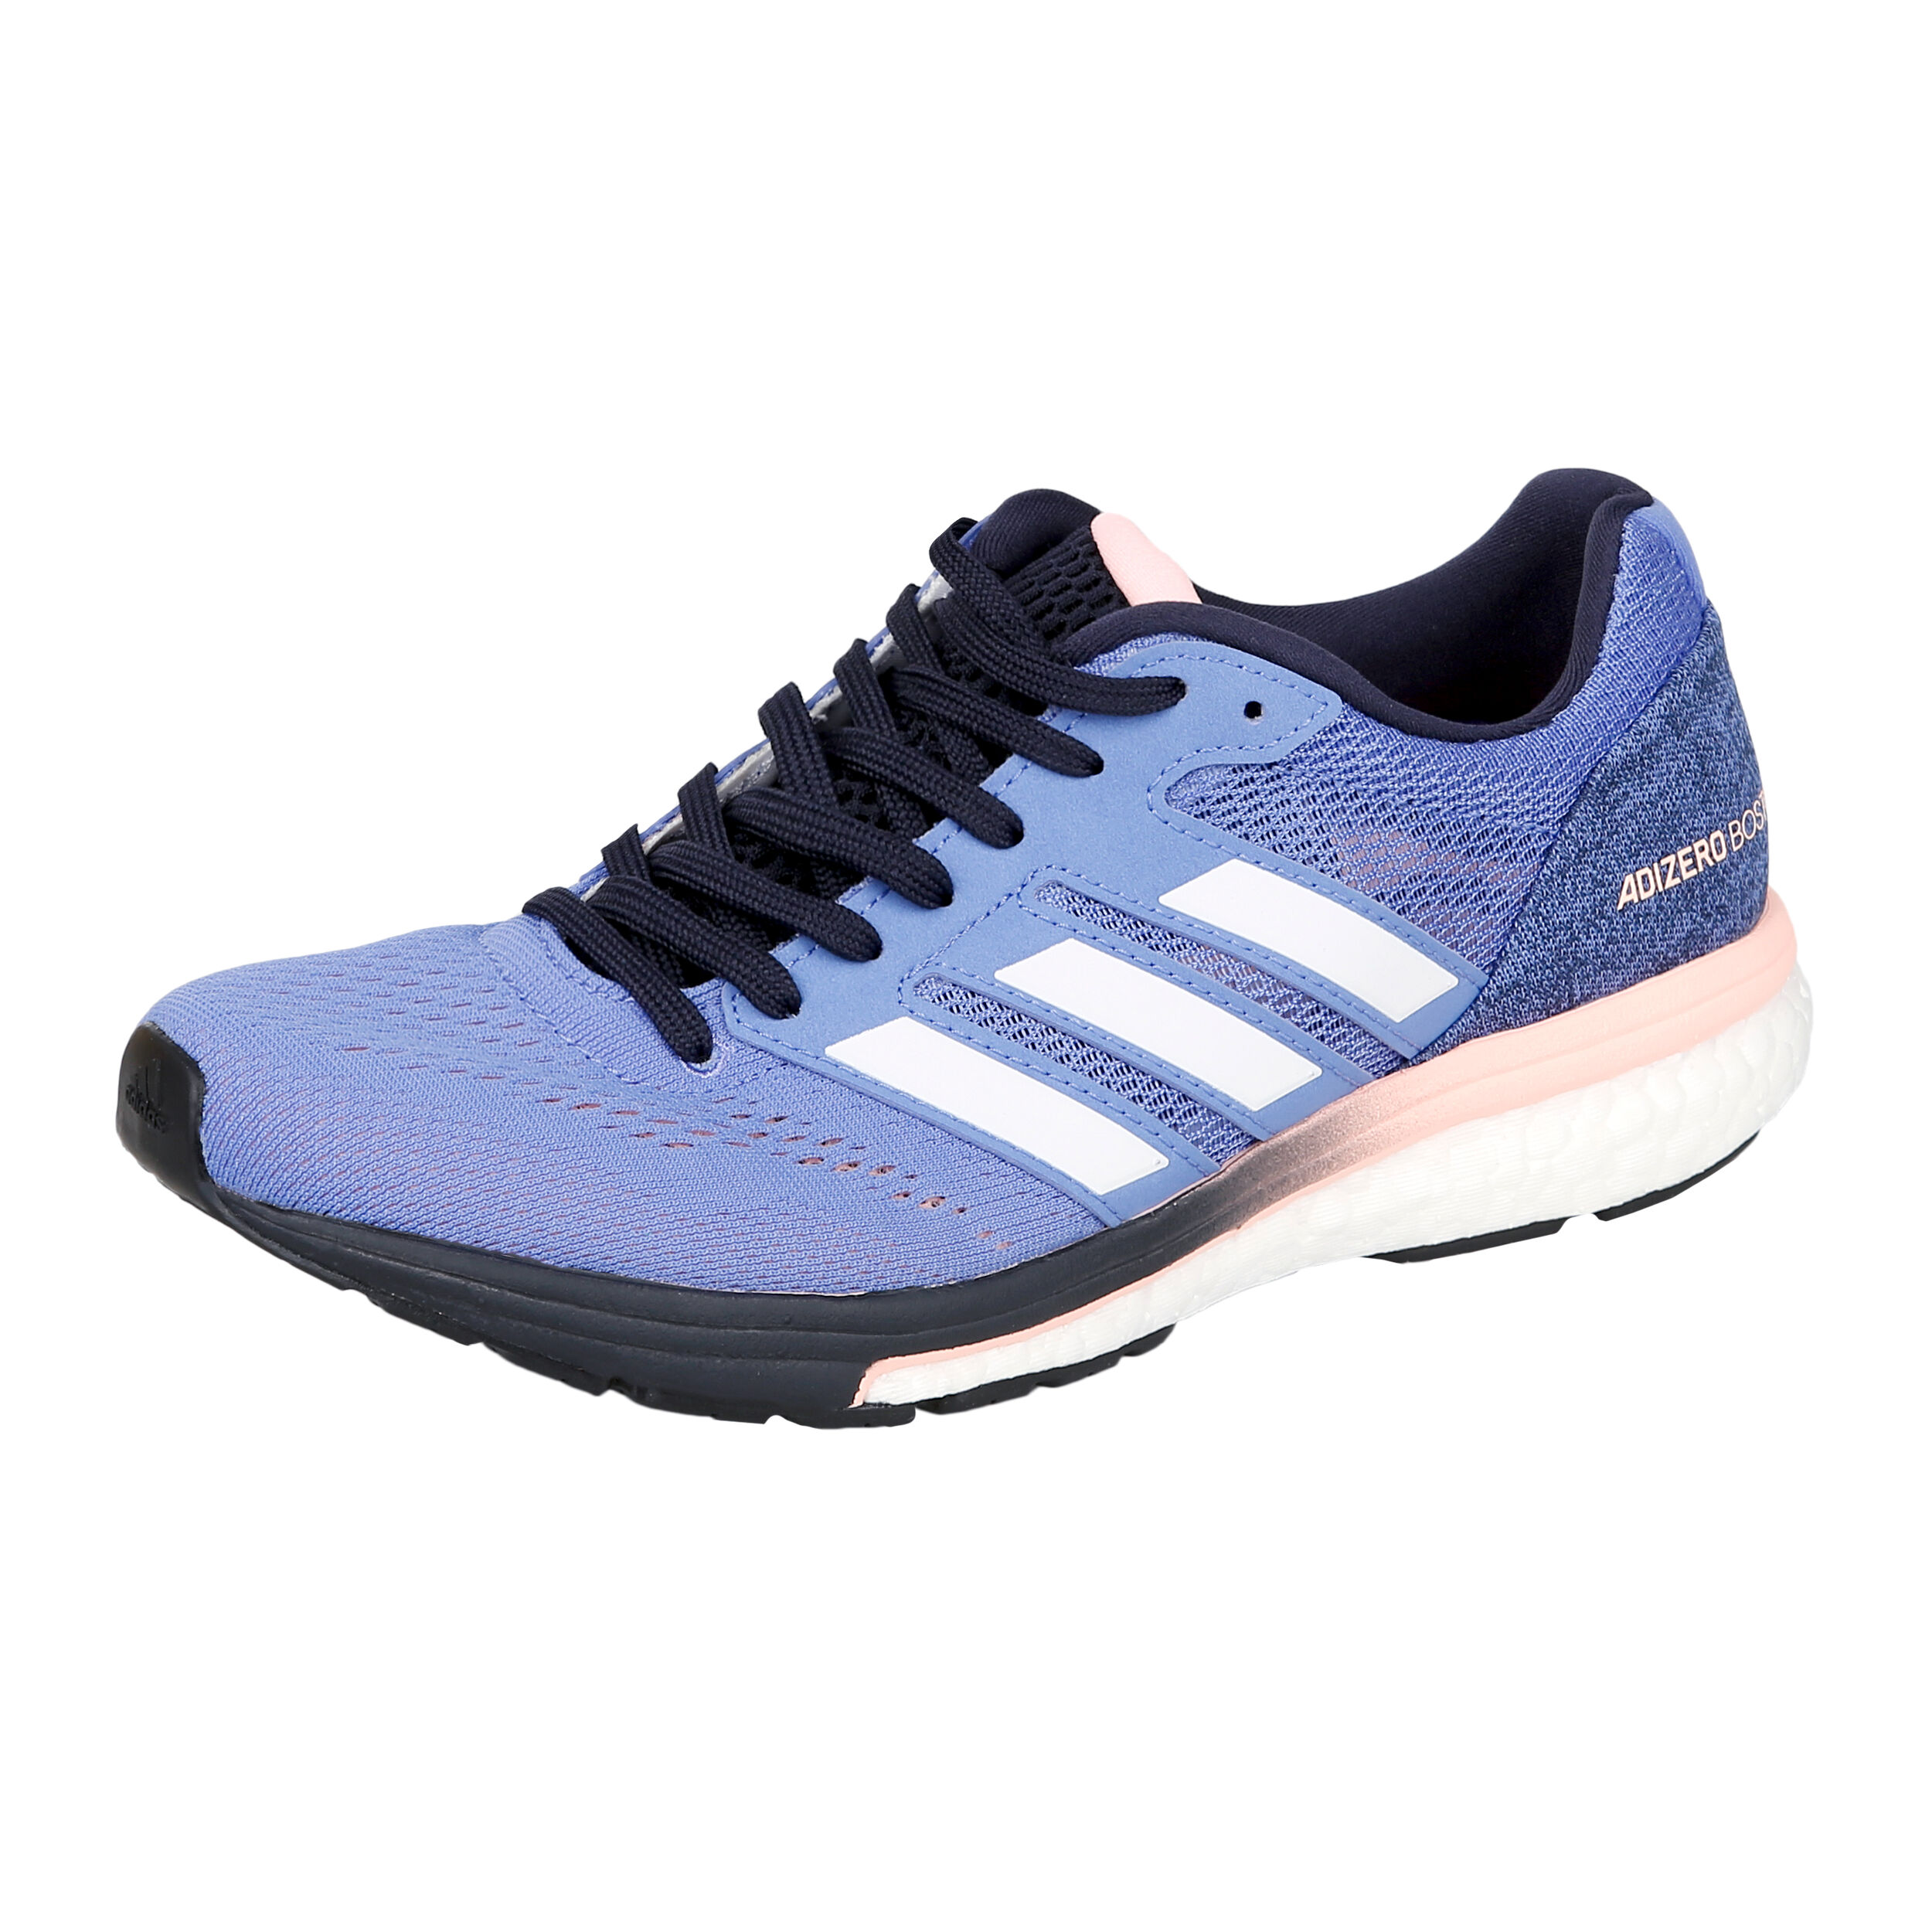 adidas Adizero Boston 7 Wettkampfschuh Damen - Blau, Apricot